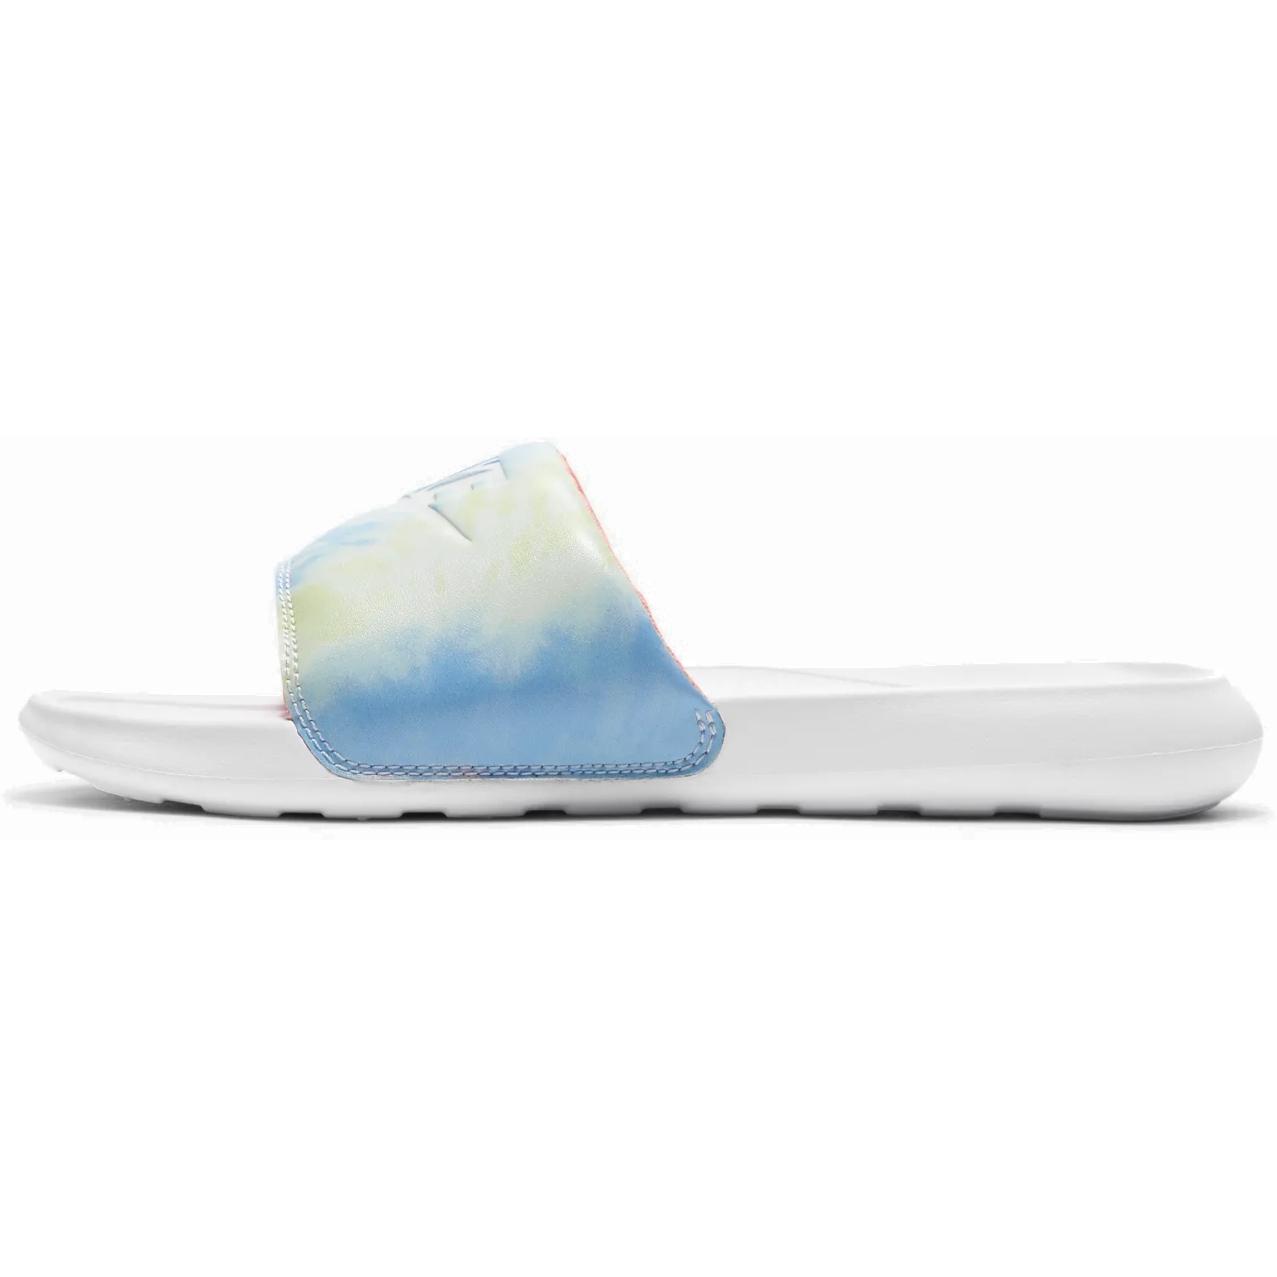 Produktbild von Nike Victori One Printed Damen Badeschuhe - White/White-Bright Mango-Sapphire CN9676-101